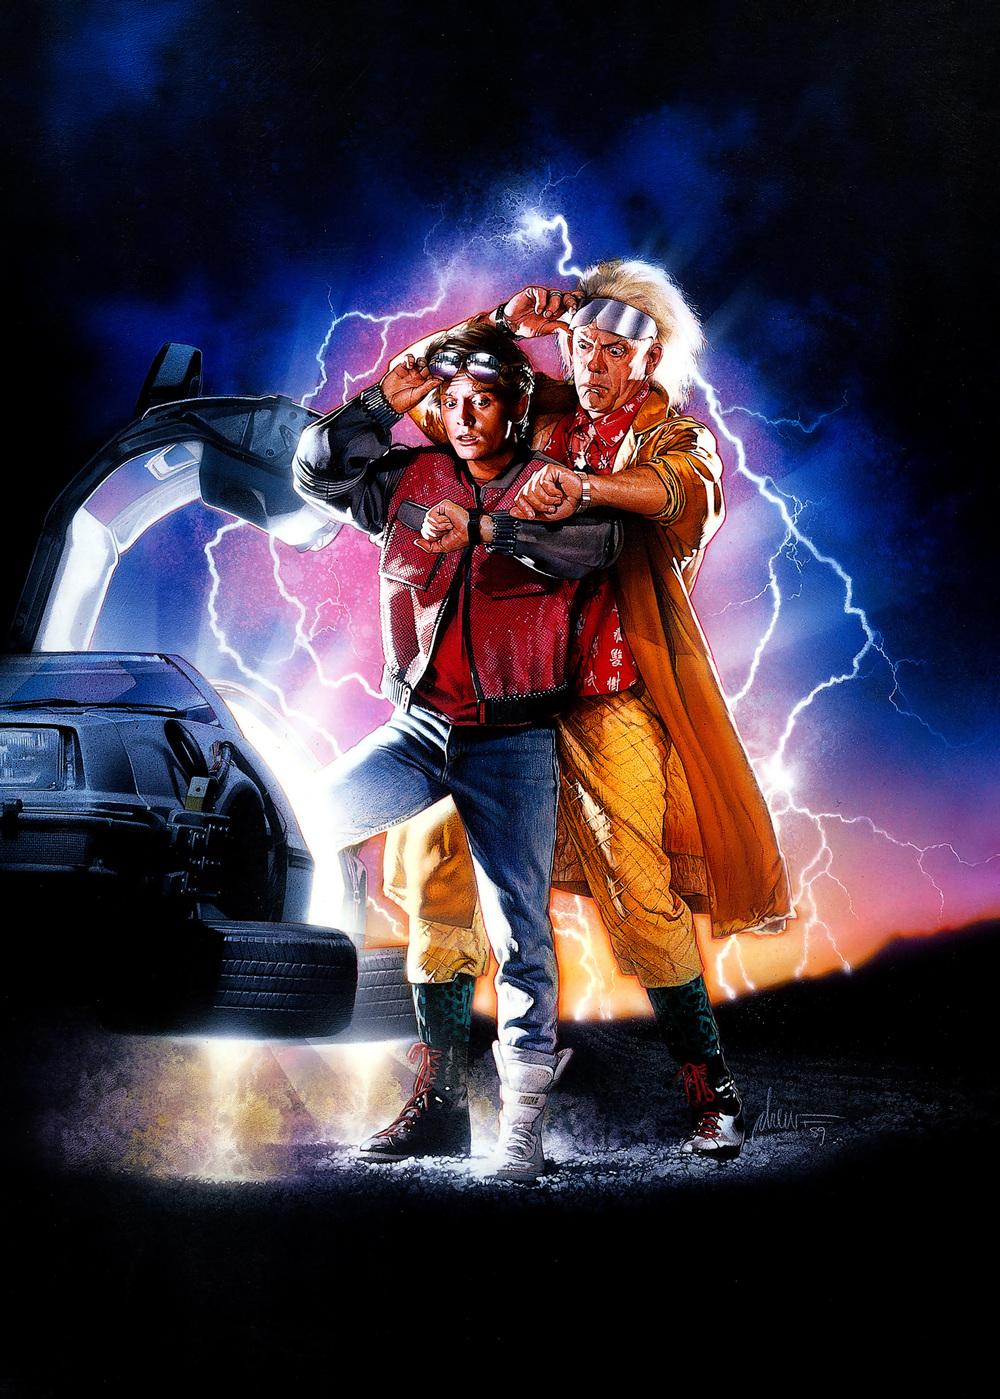 Volver al futuro Parte II (1989) - Robert Zemeckis